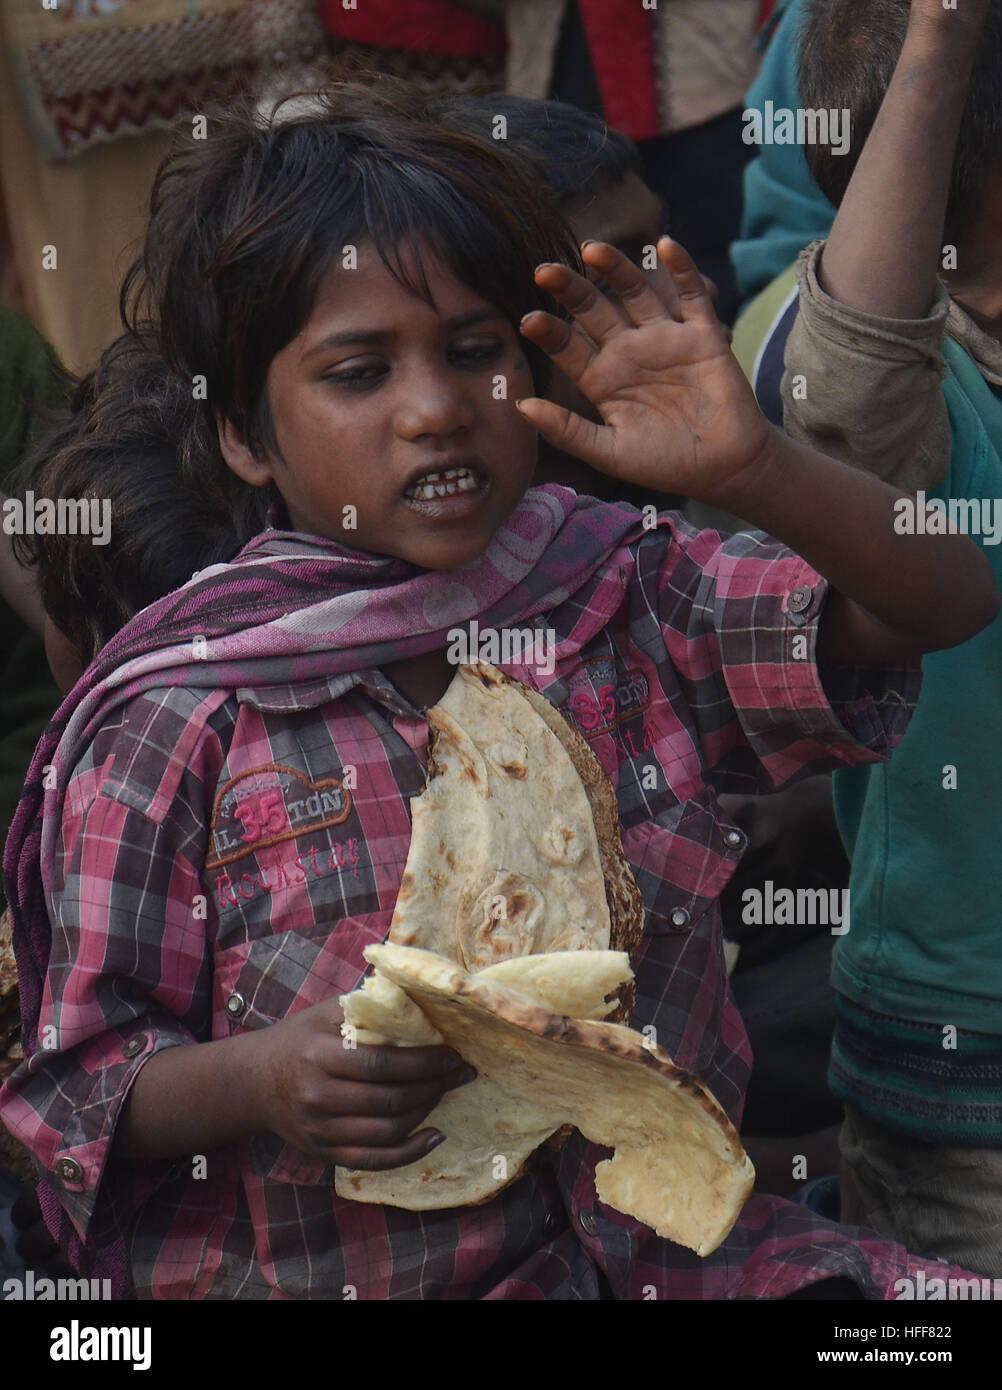 Pakistanische Arme Menschen halten trockenes Brot, wie sie gegen ...